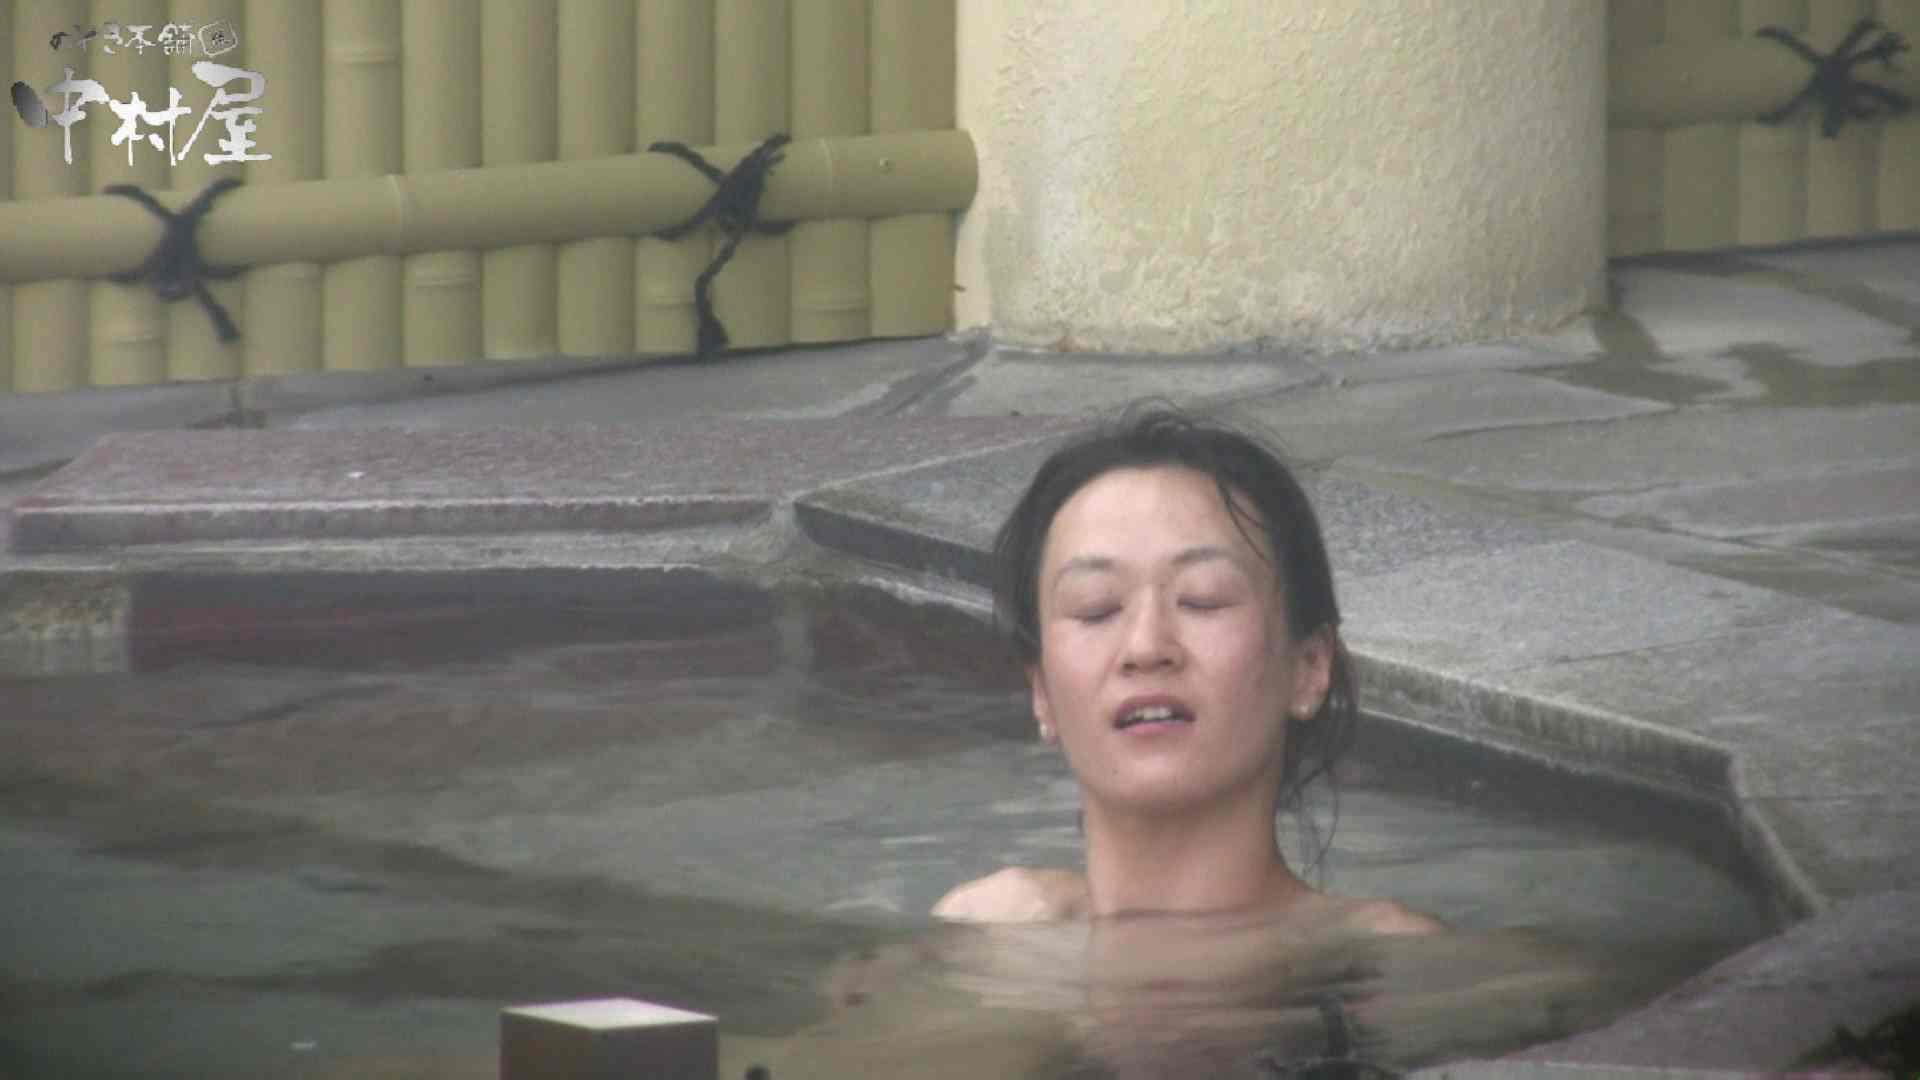 Aquaな露天風呂Vol.928 OLセックス | 盗撮  99画像 4